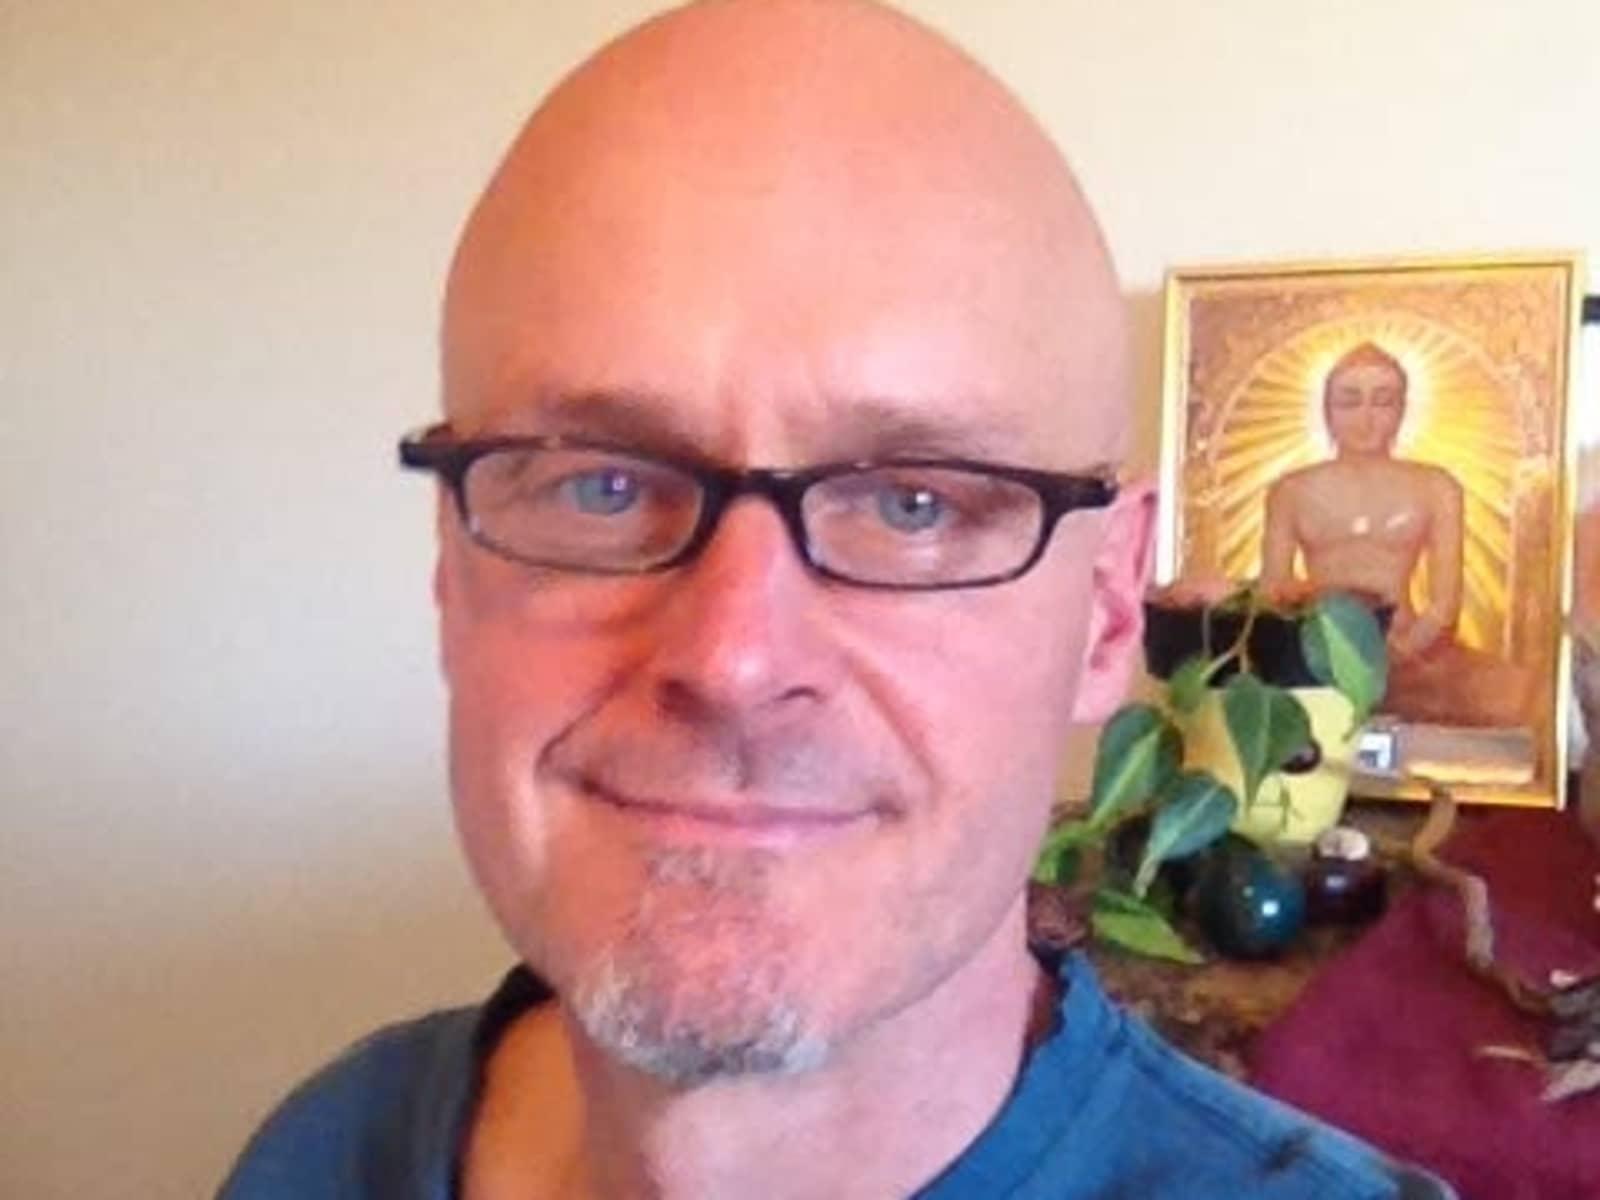 Zachary from Oakland, California, United States